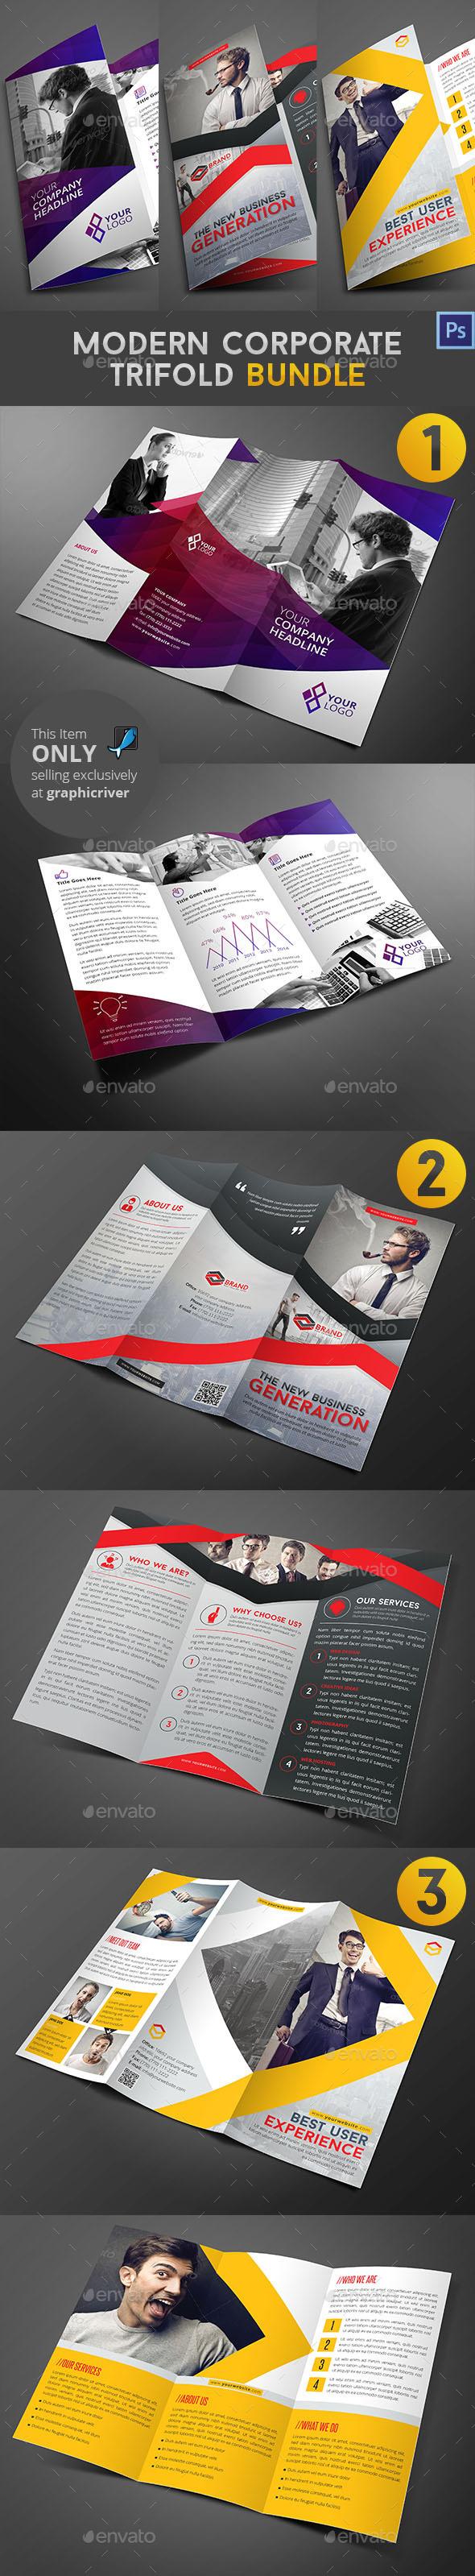 Modern Corporate Trifold Bundle - Corporate Brochures